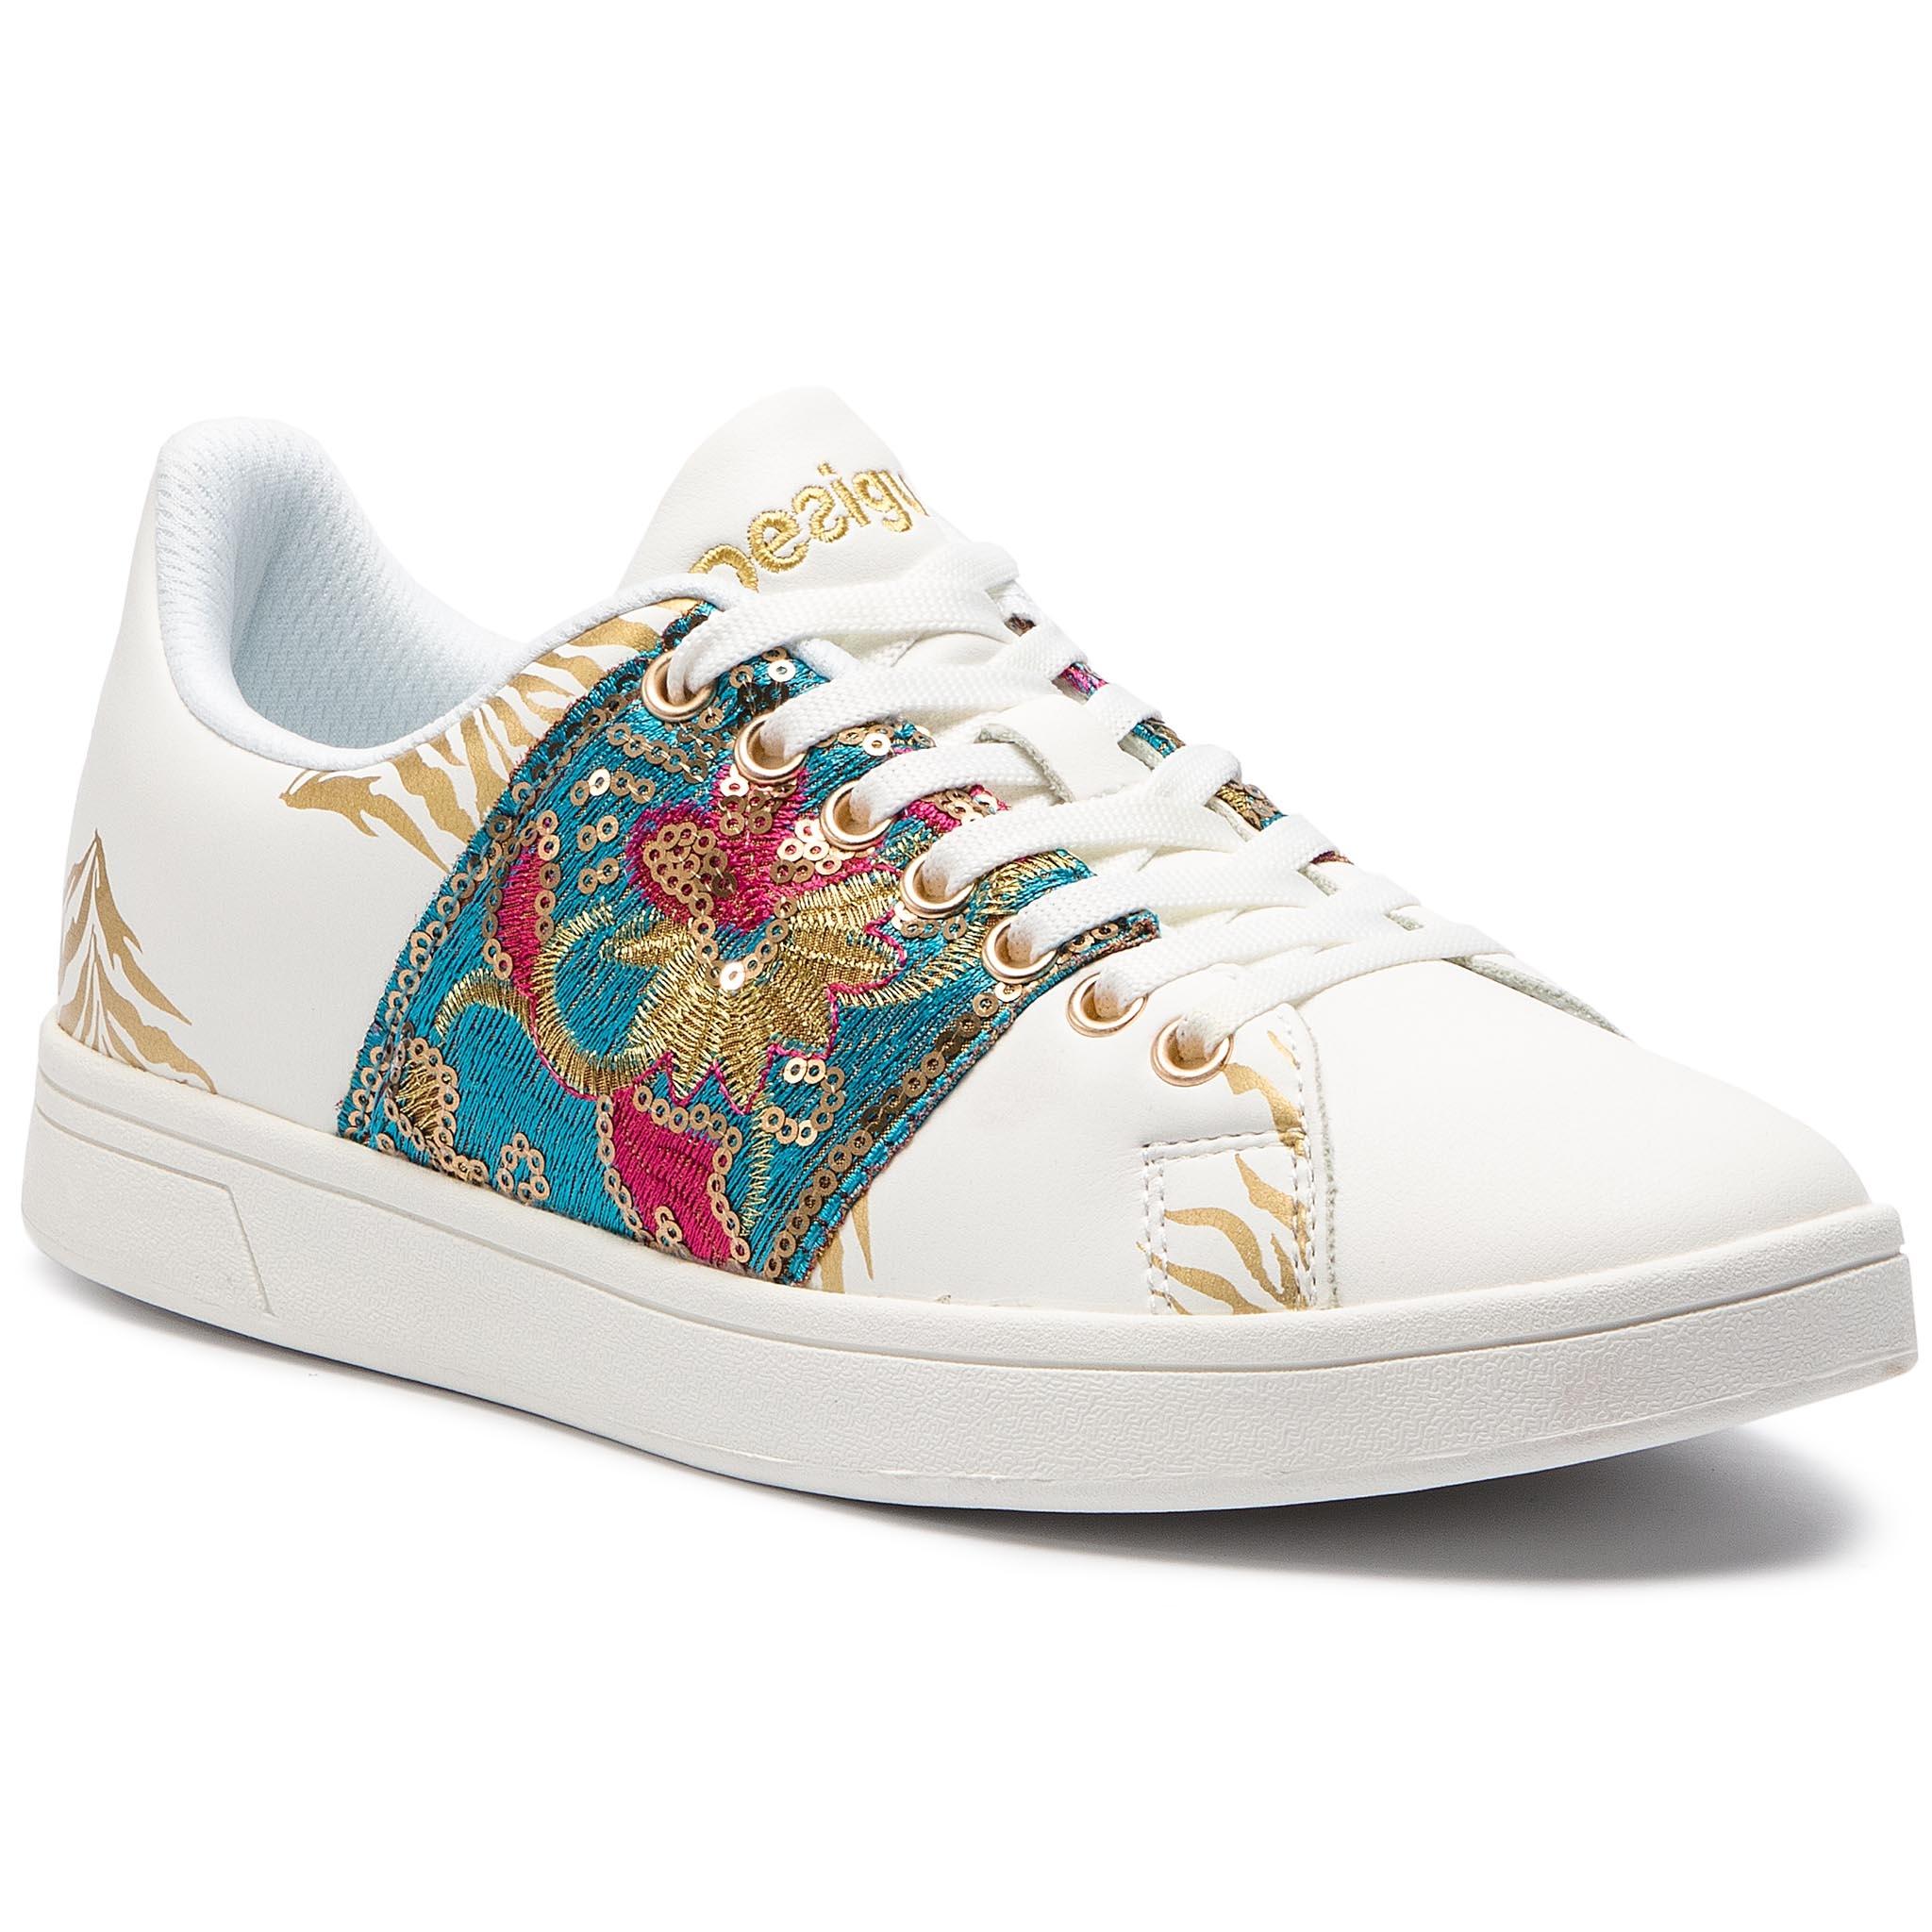 9cf1b333242 Desigual Shoes Cosmic Exotic Tropical 19SSKP11 - Glami.cz